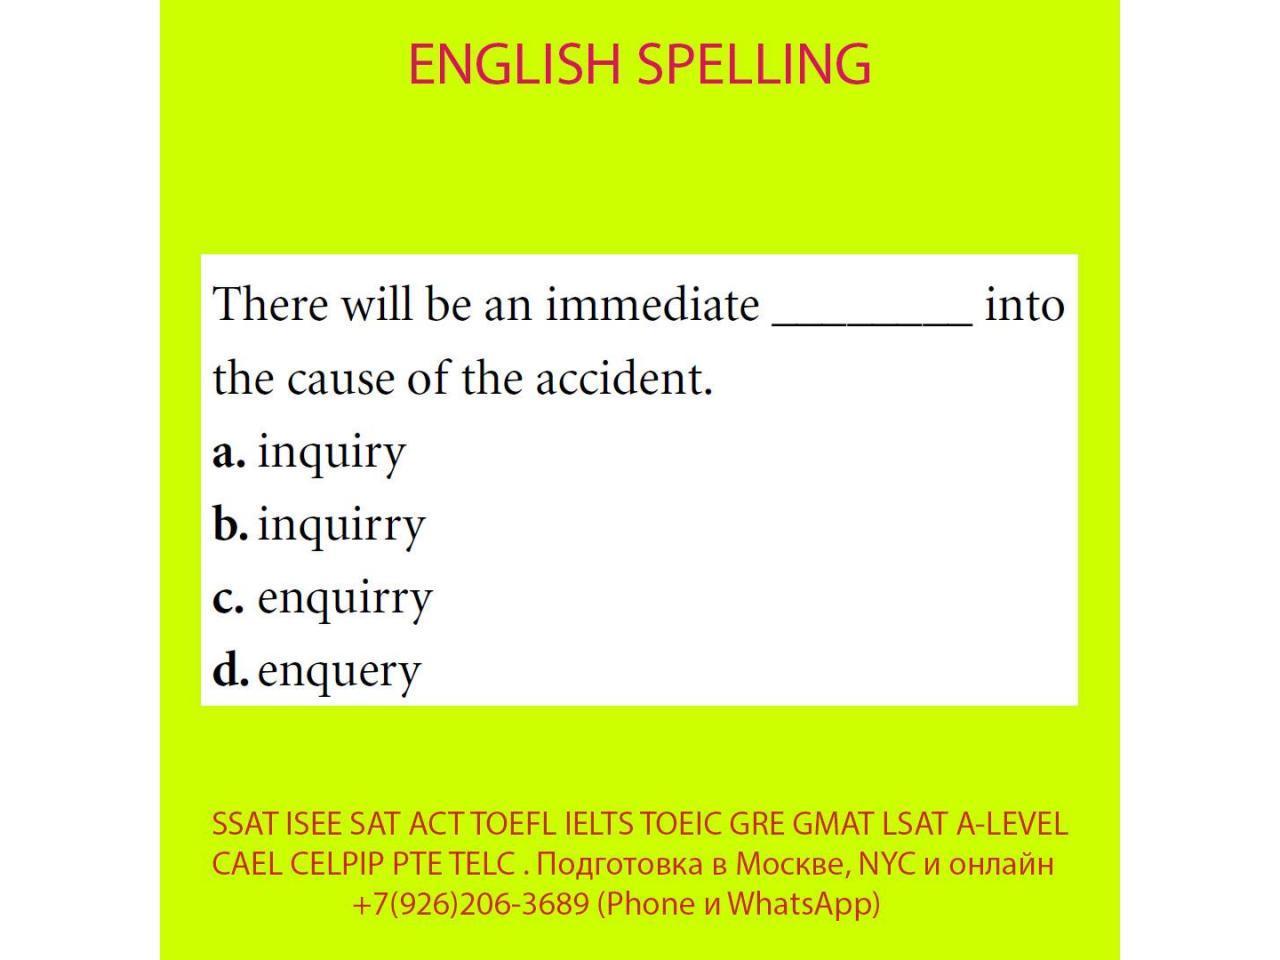 Подготовка к SSAT ISEE SAT ACT TOEFL IELTS TOEIC GRE GMAT LSAT A-LEVEL BEC CAEL CELPIP PTE TELC - 11